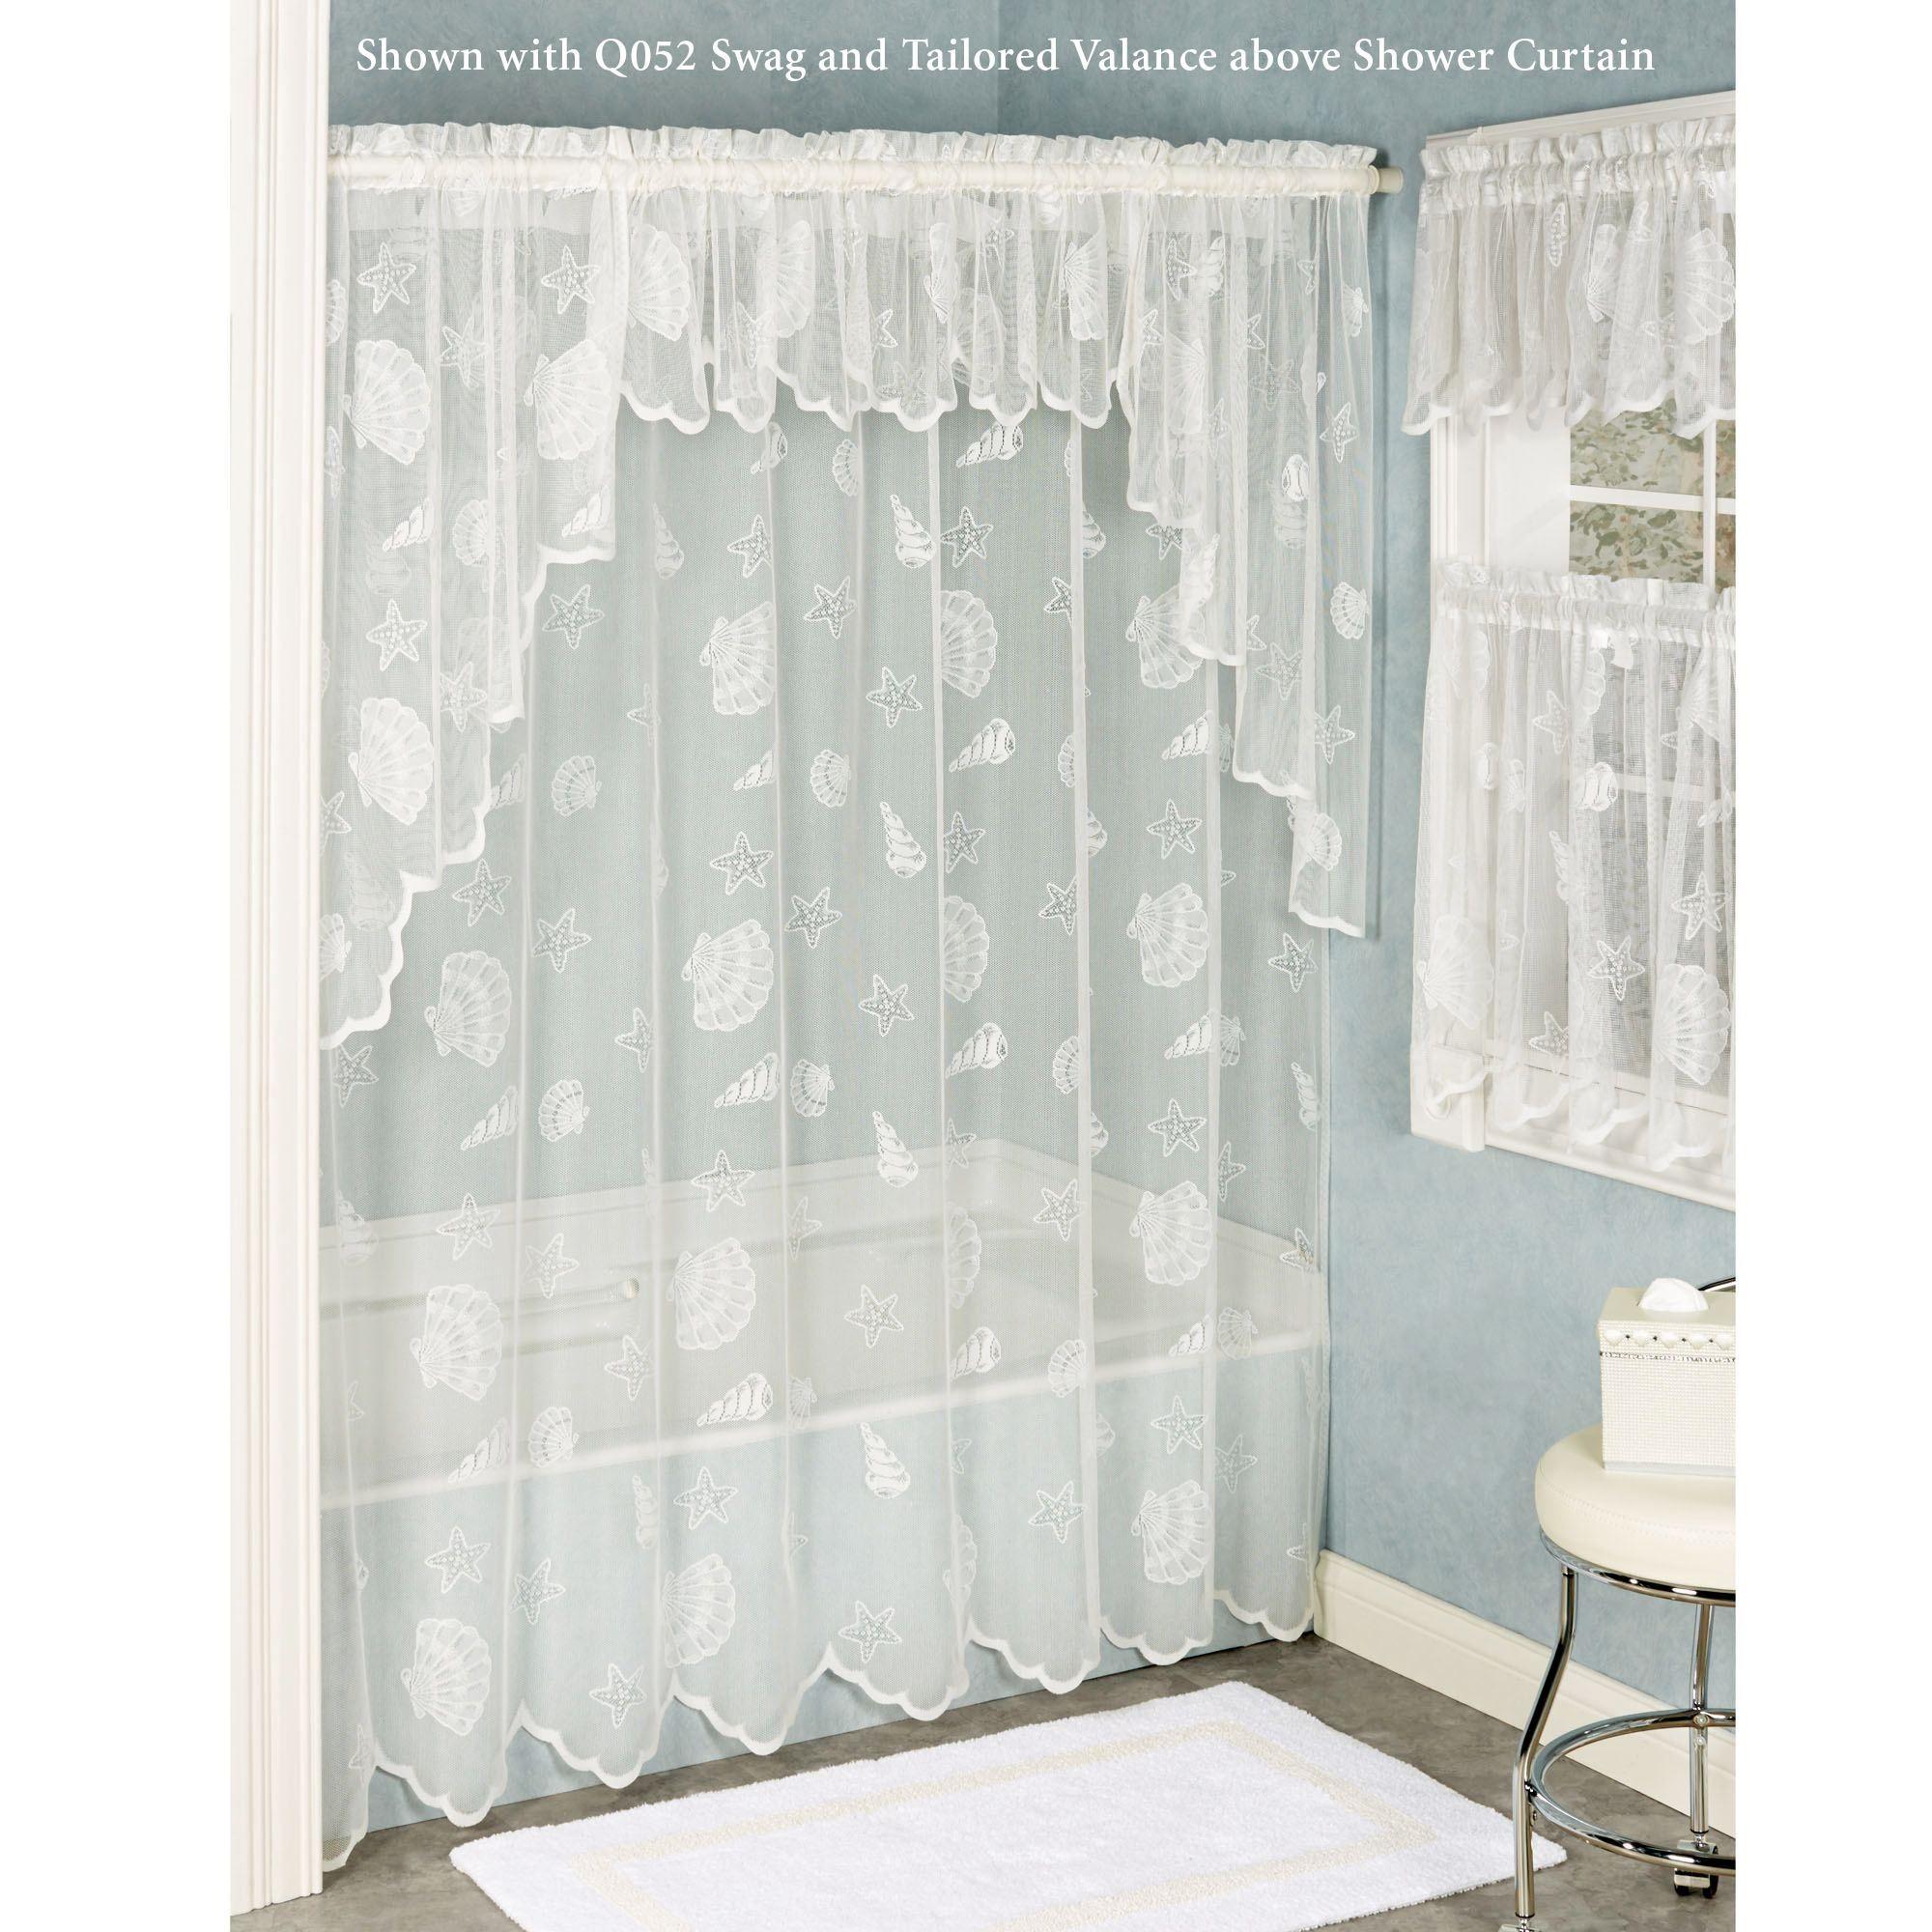 Single Swag Shower Curtain